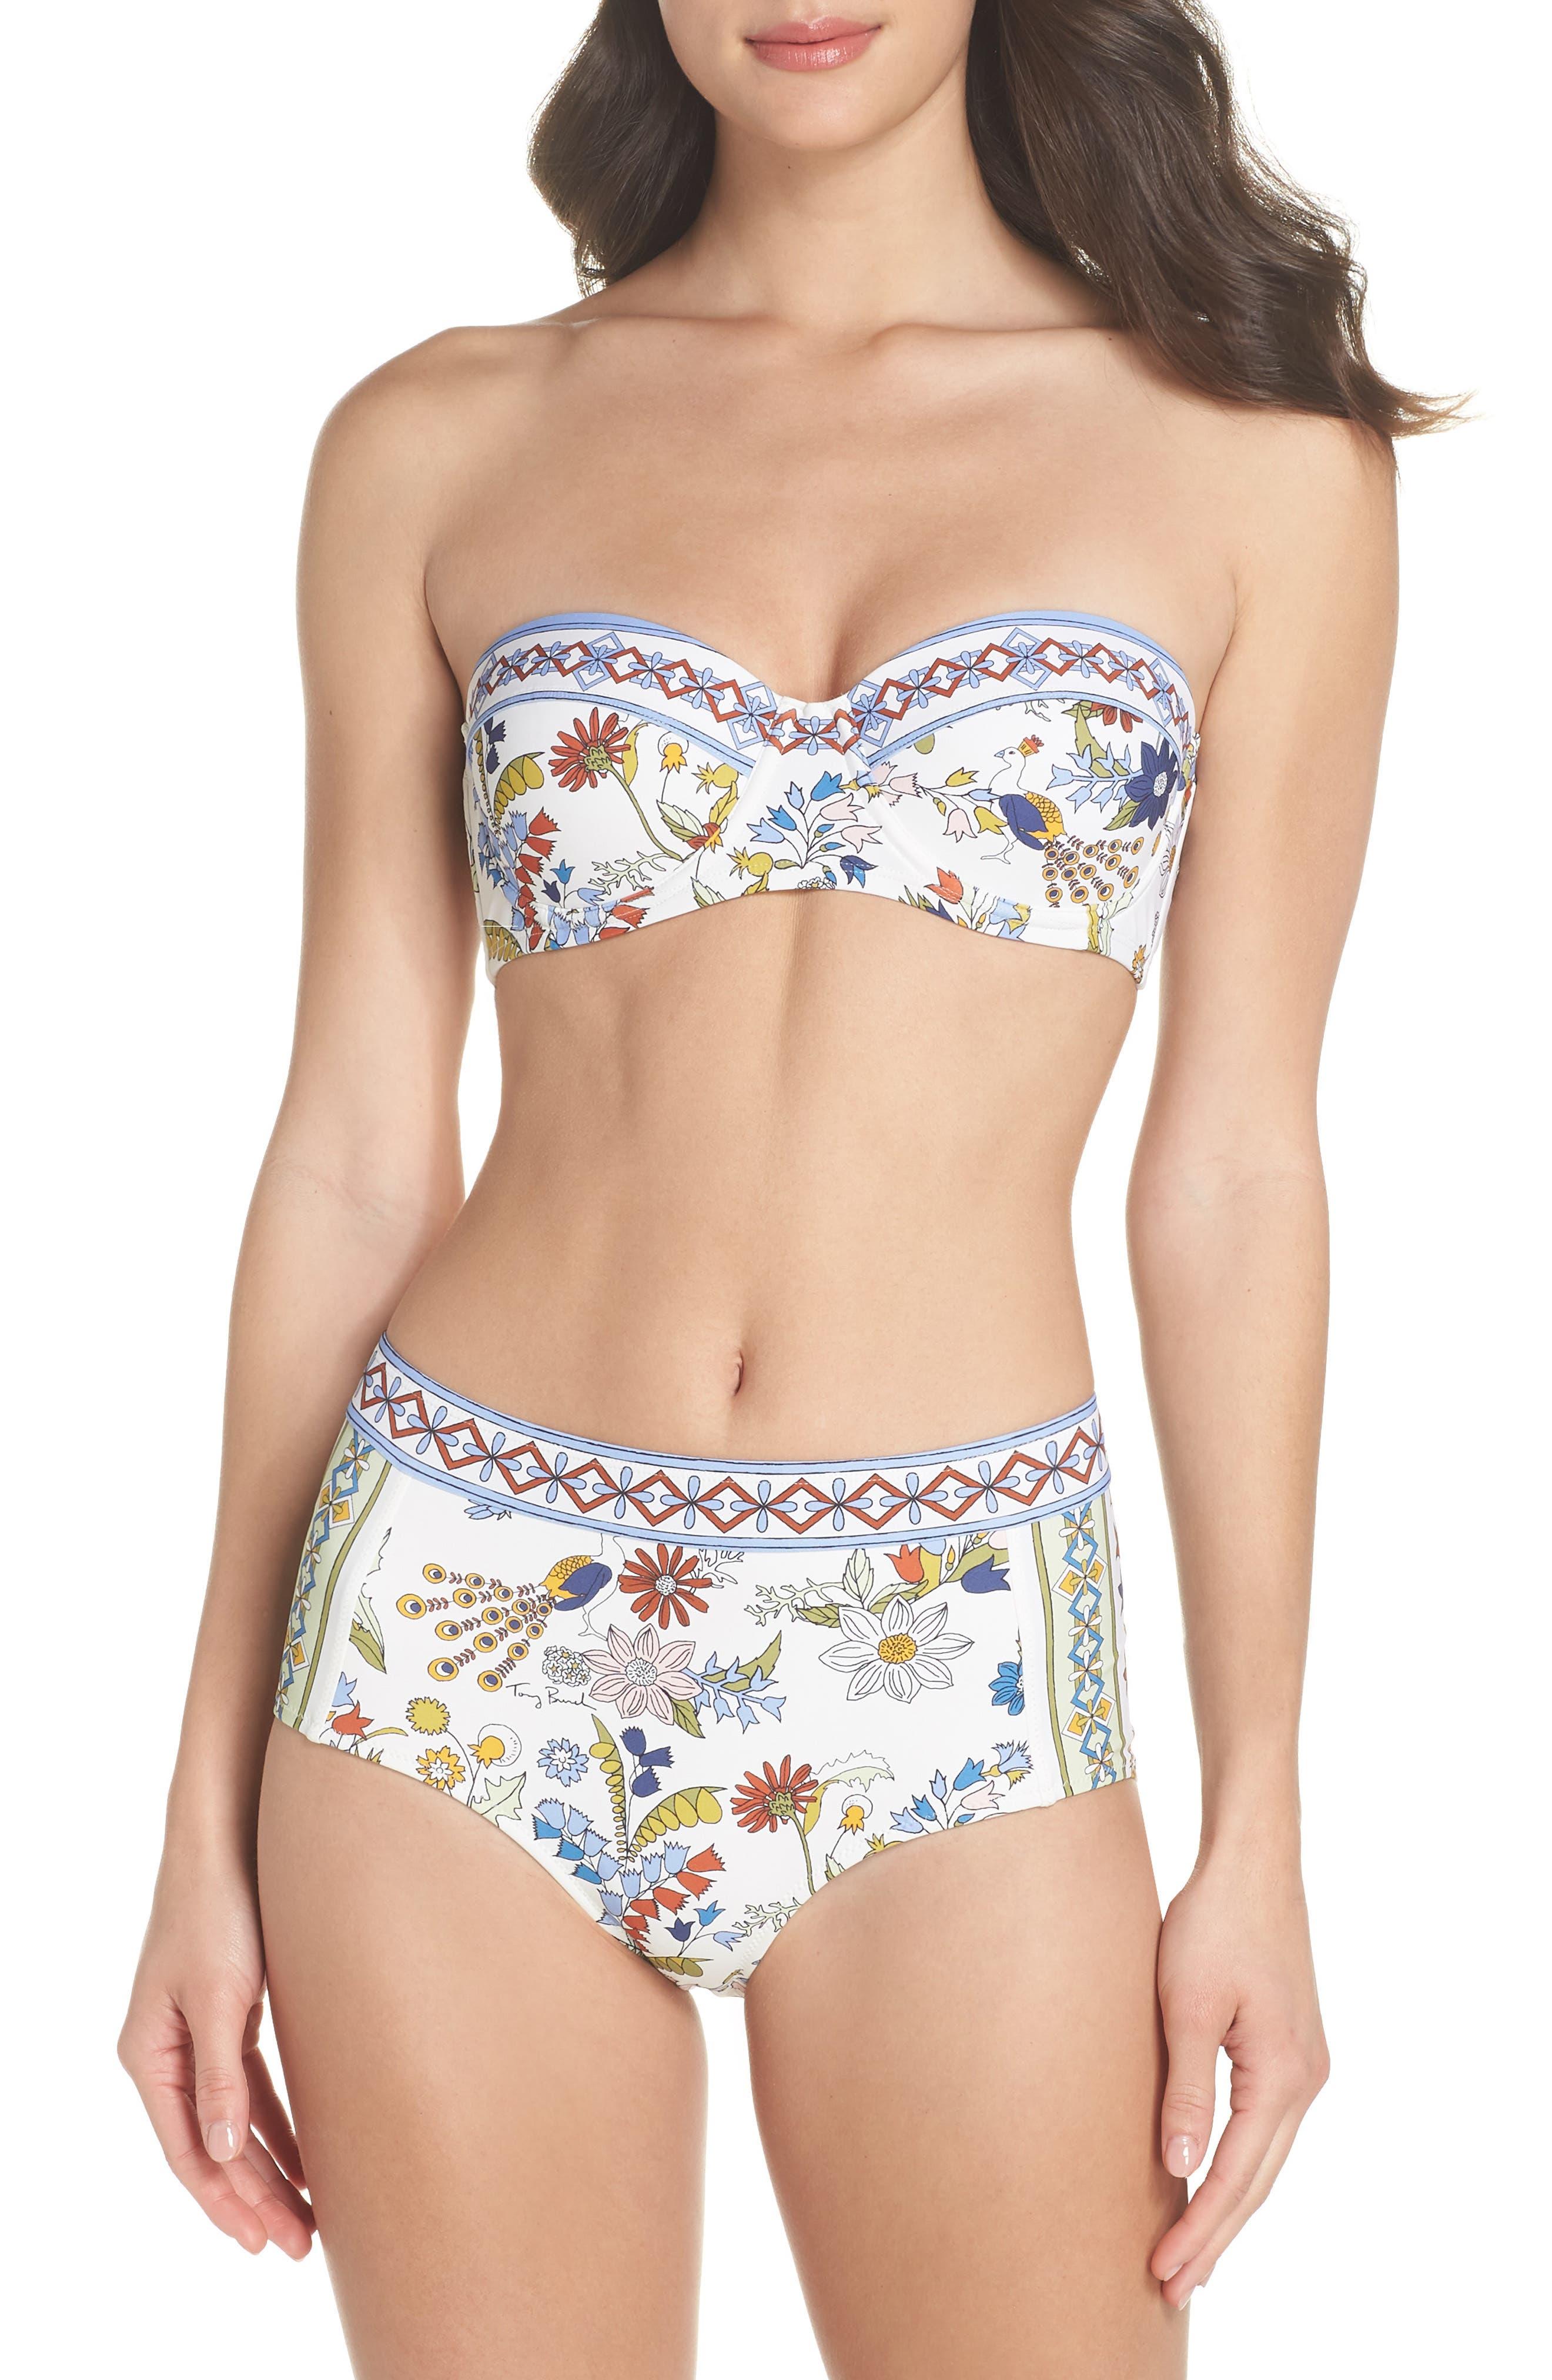 Meadow Folly Bikini Top,                             Alternate thumbnail 6, color,                             Ivory Meadow Folly